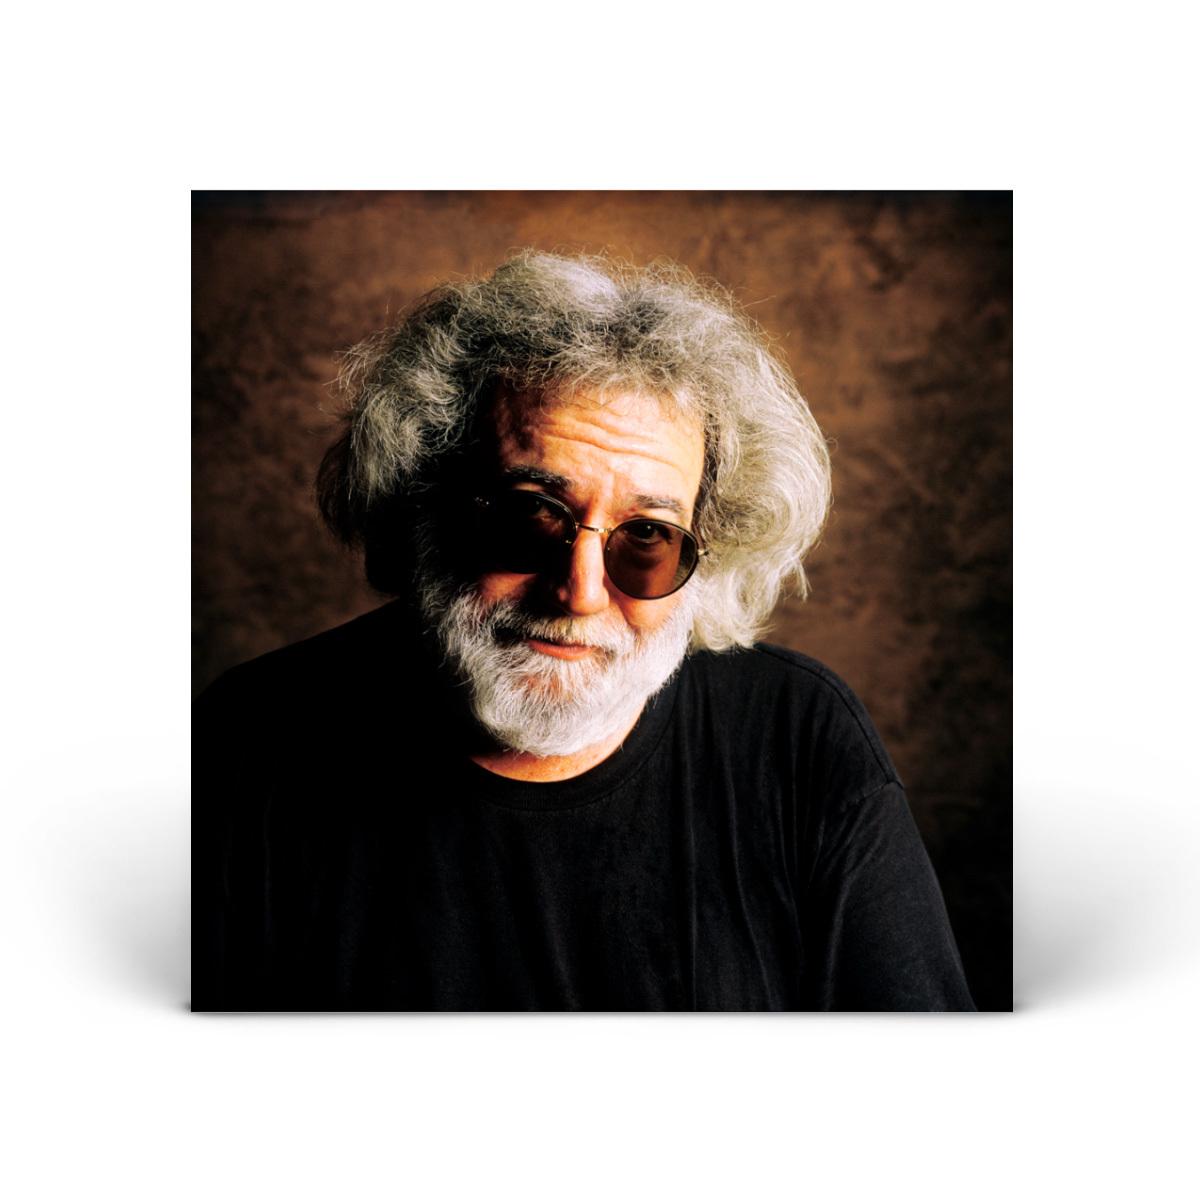 Jerry Garcia - 9/29/93 Color